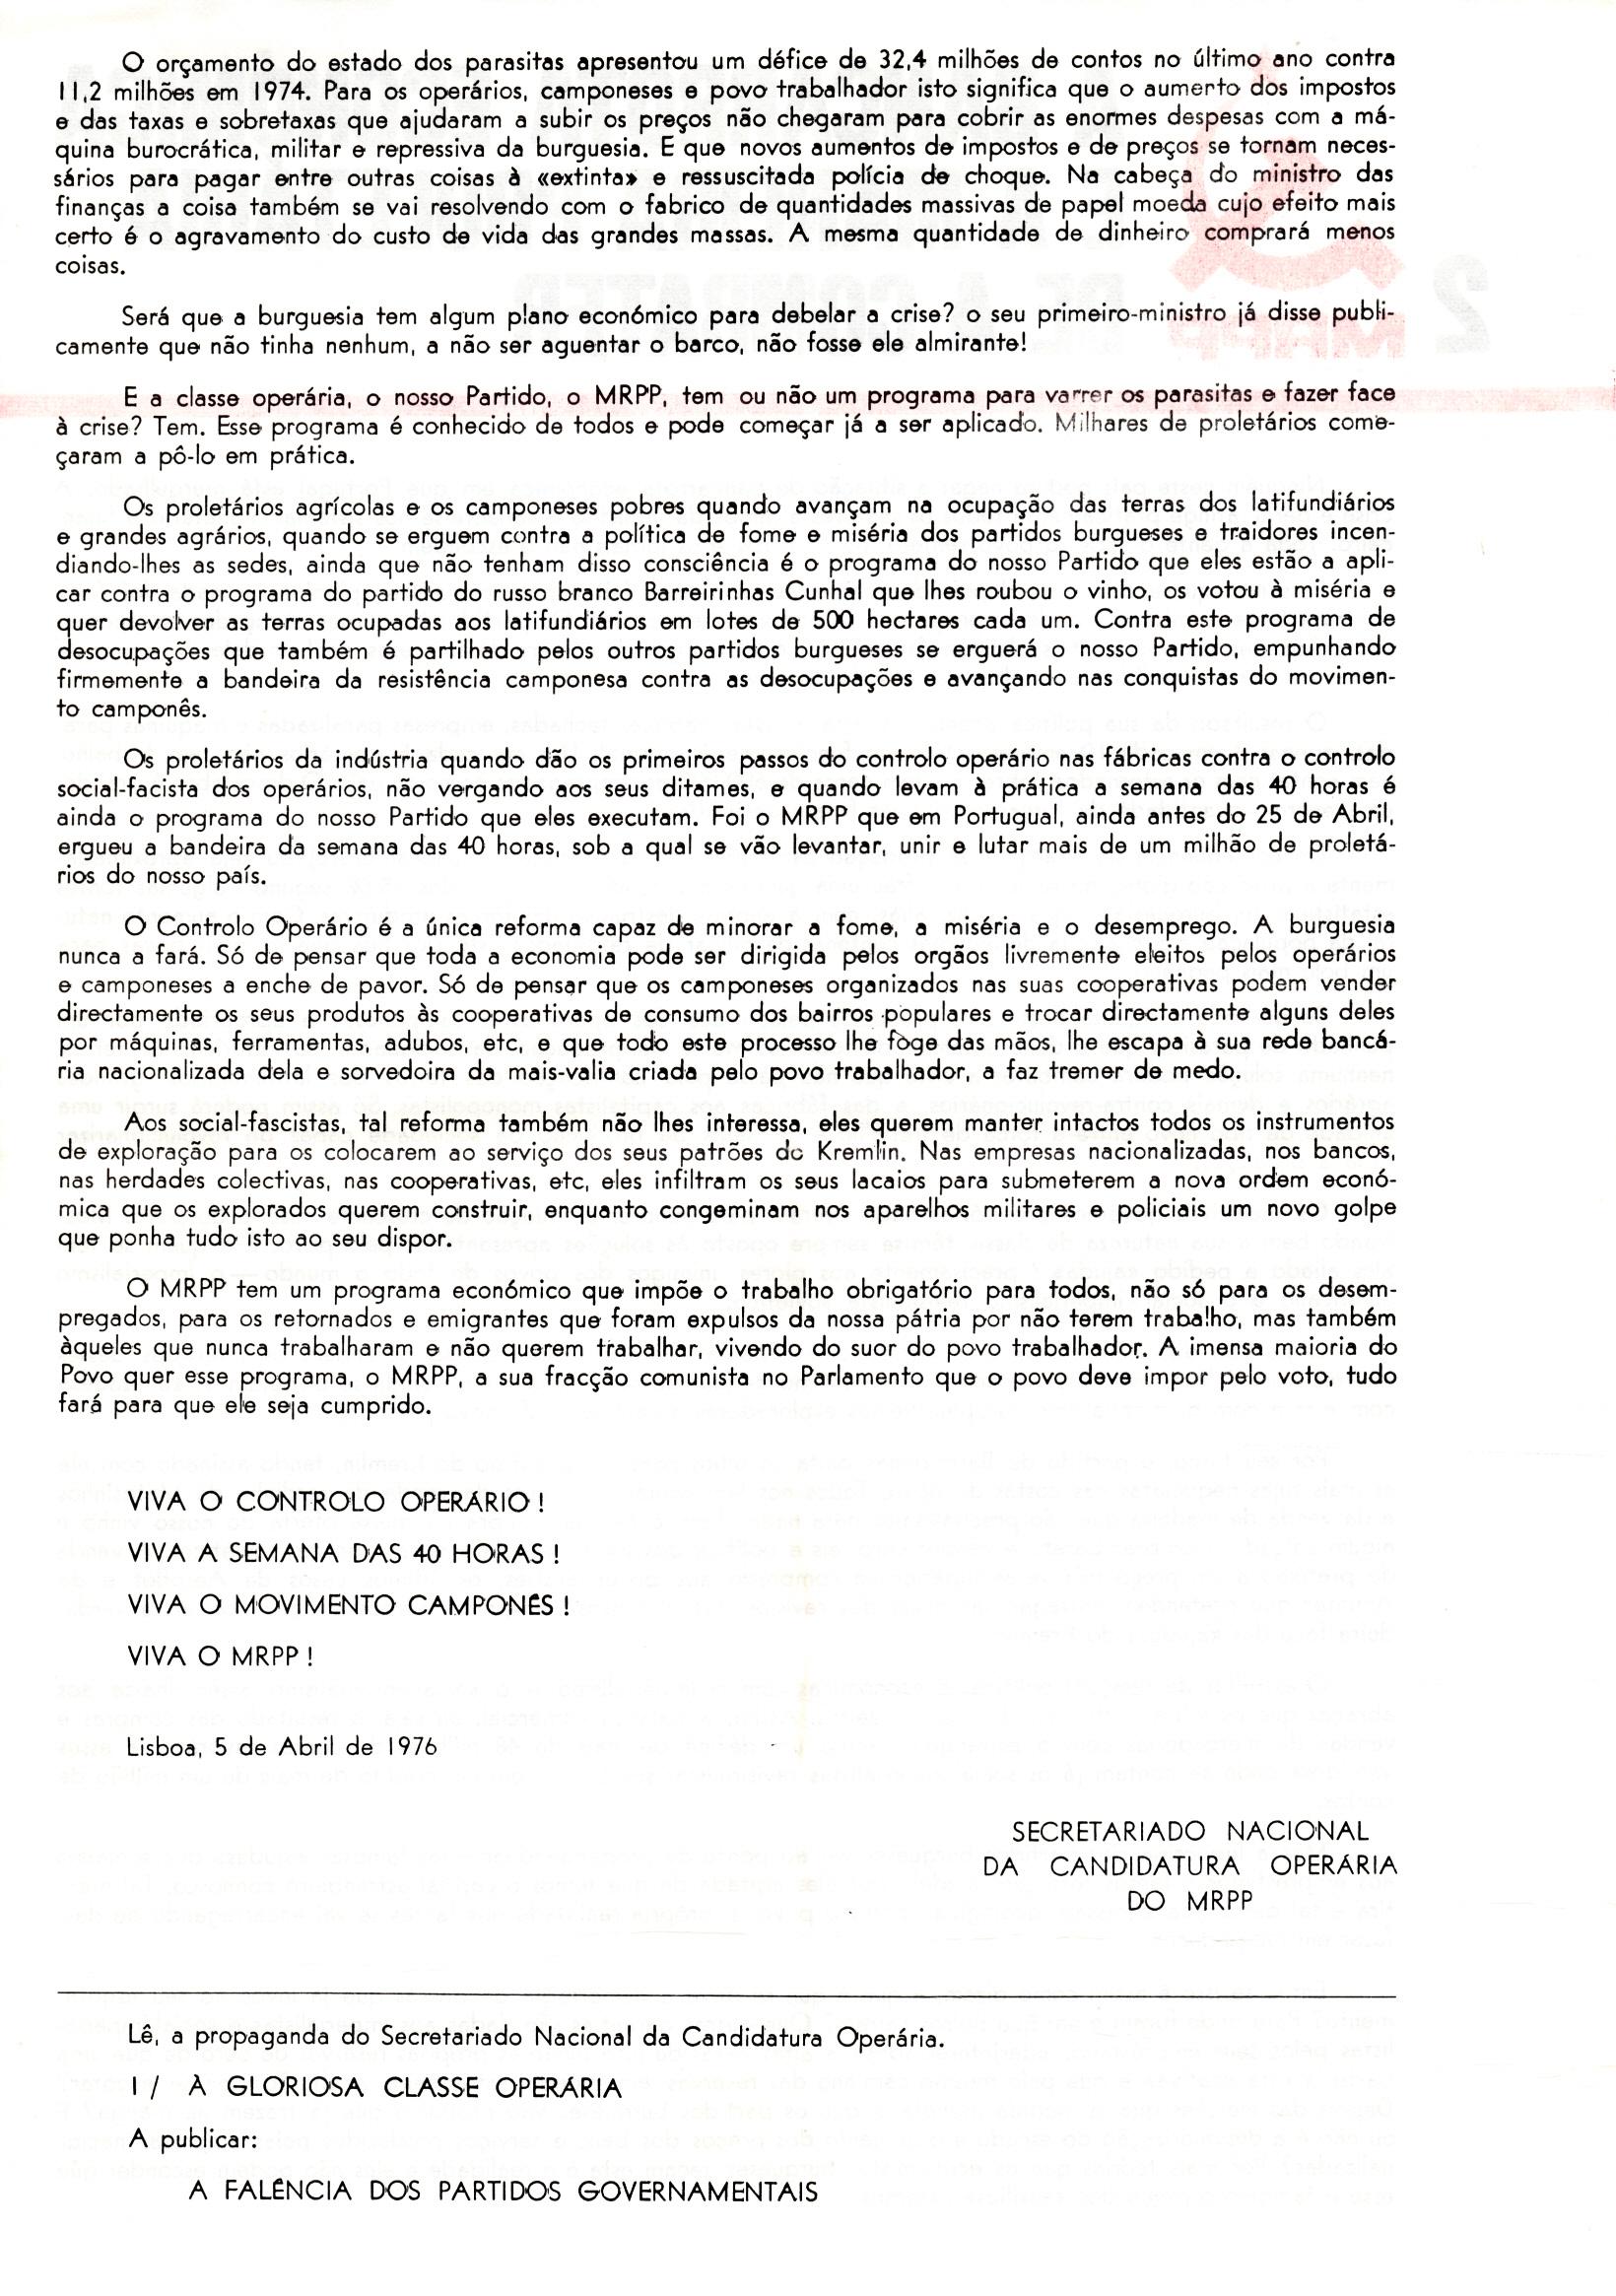 mrpp_1976_eleicao_programa_0004